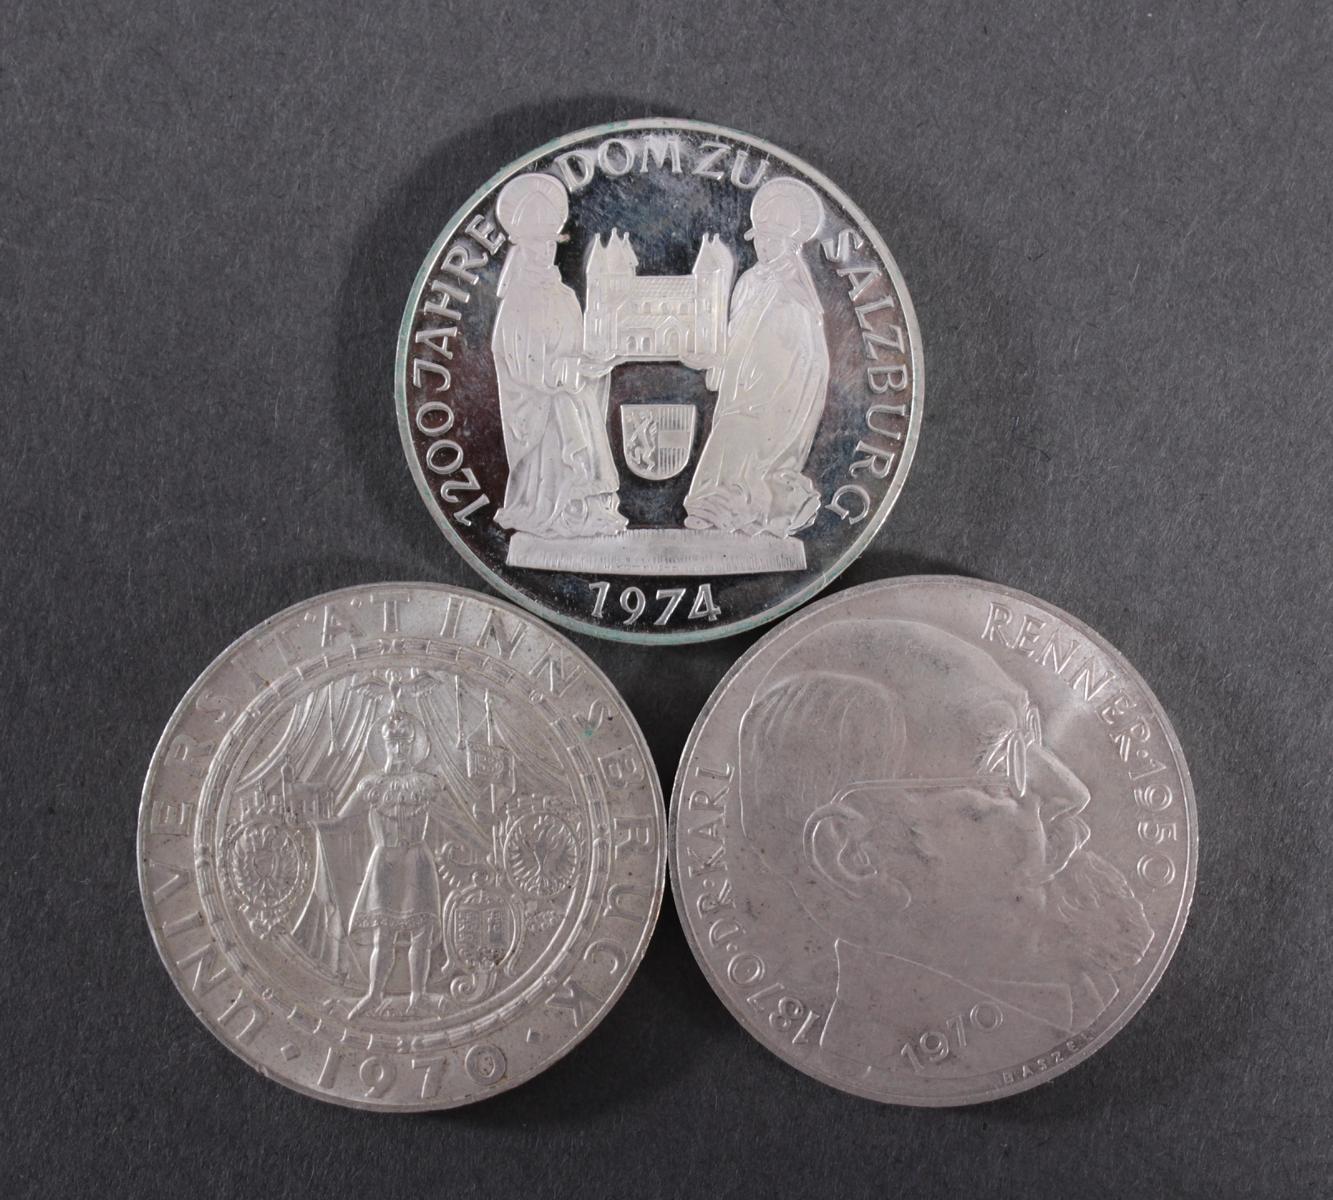 50 Schilling Silbermünzen – 3 Stück